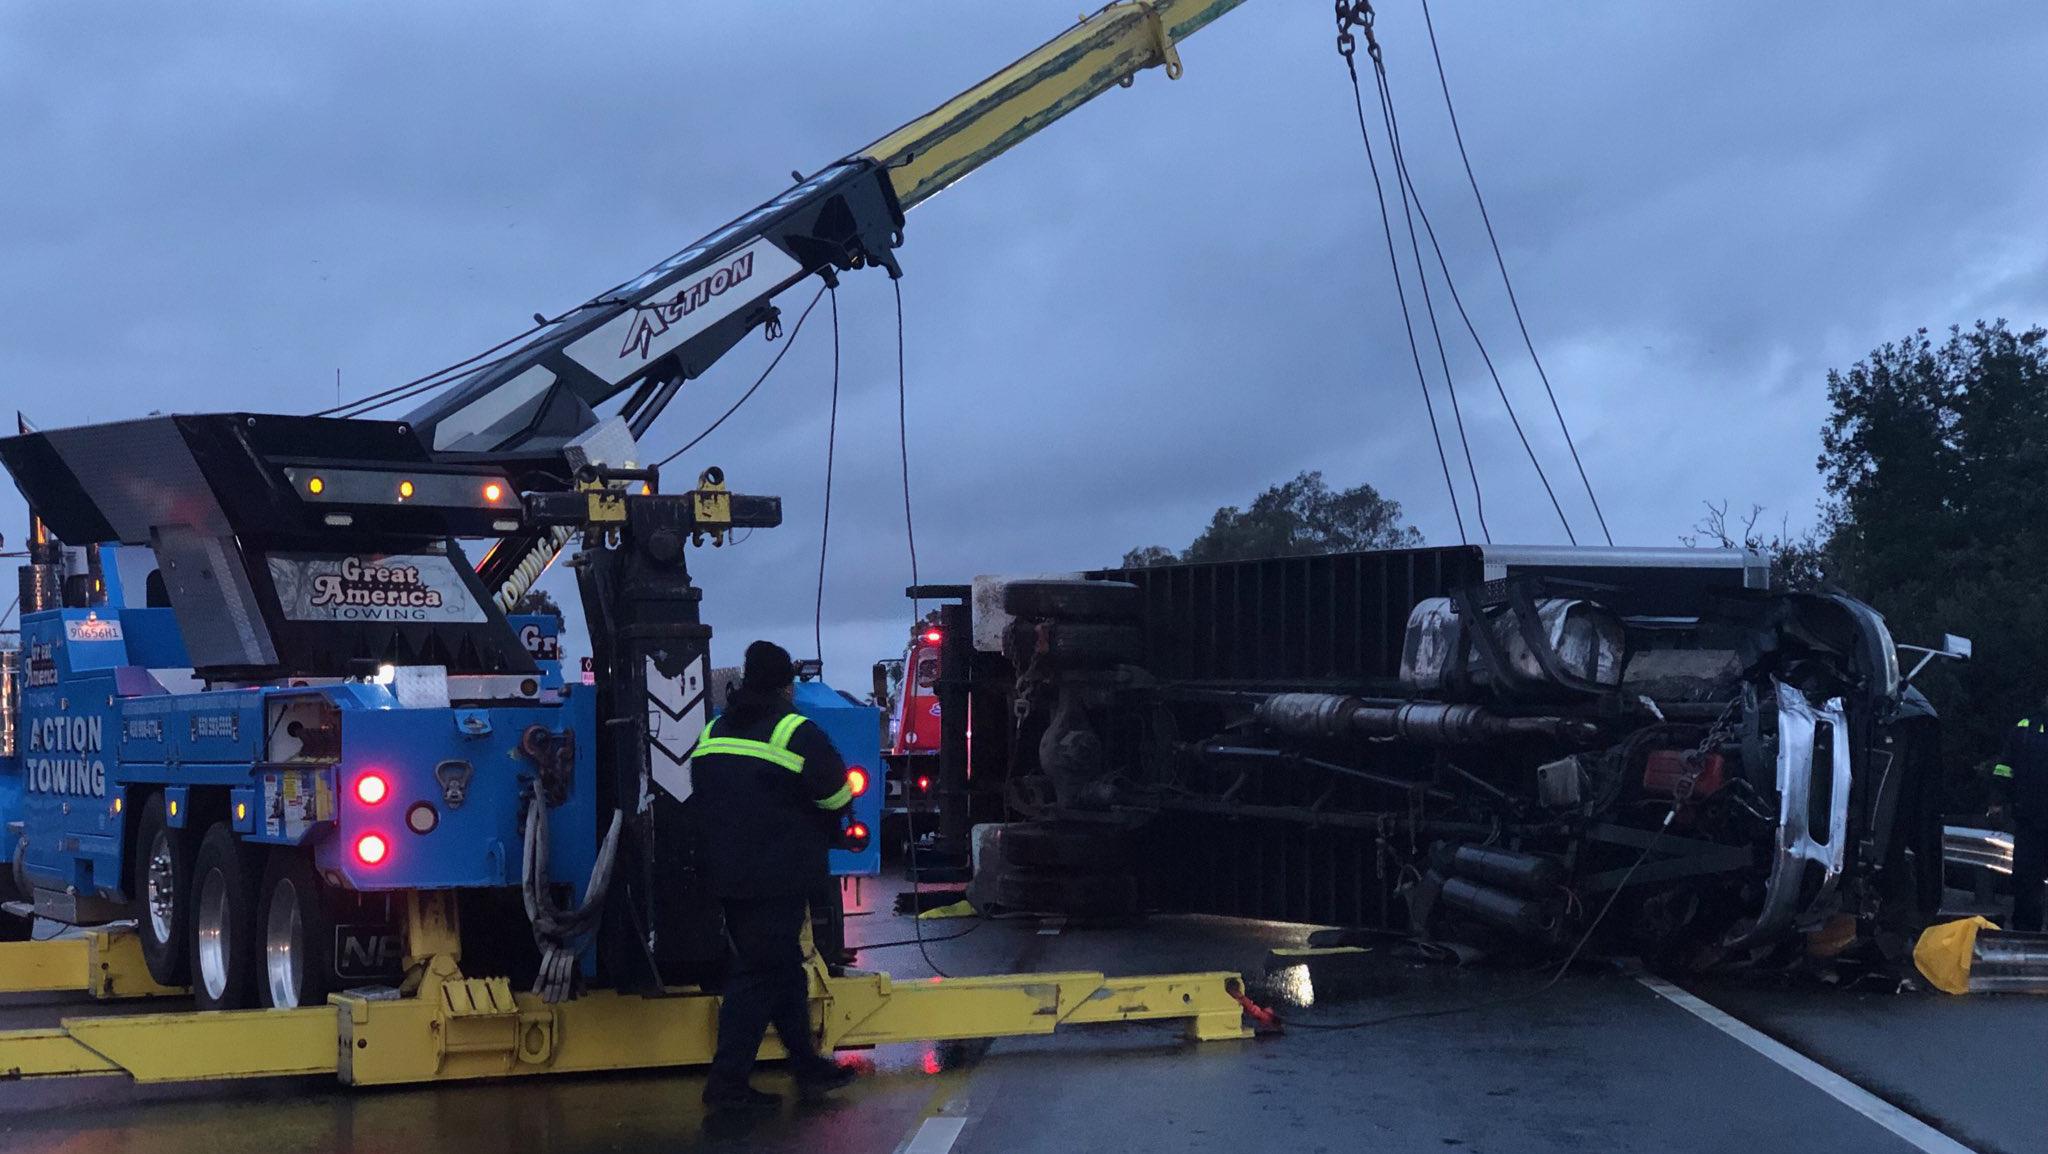 1 killed in box truck crash on NB Hwy 101 in San Jose